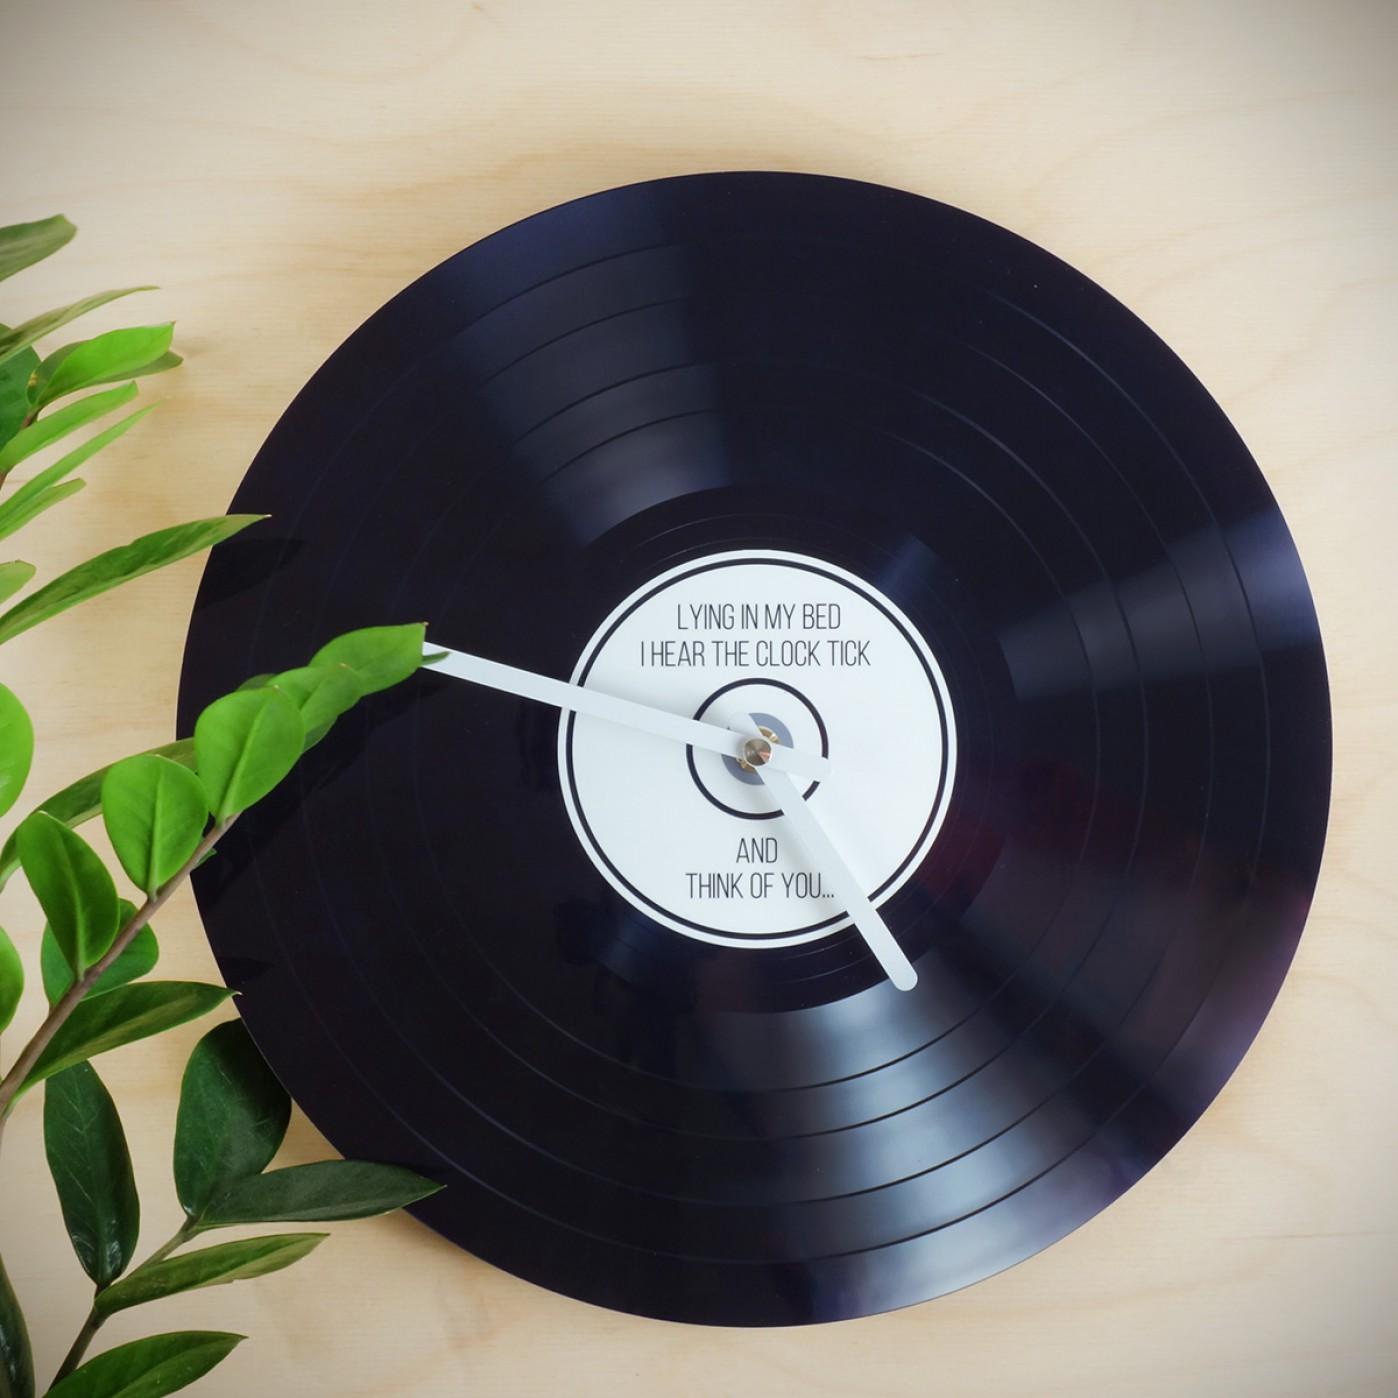 Personalisierbare schallplatten wanduhr get edgy - Schallplatten wand ...